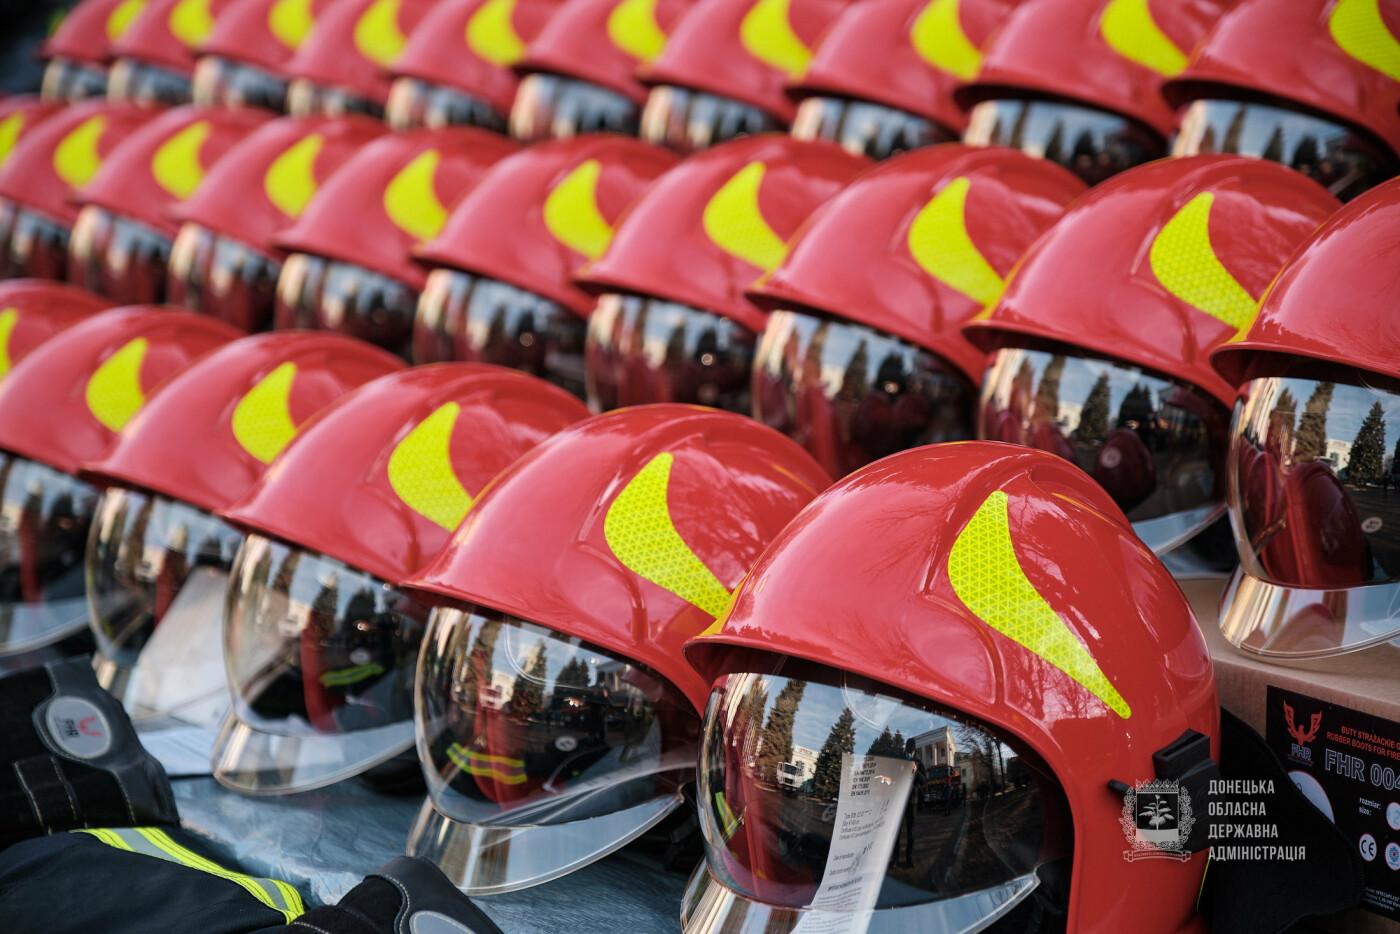 Слов'янські рятувальники отримали нову пожежну автоцистерну, фото-8